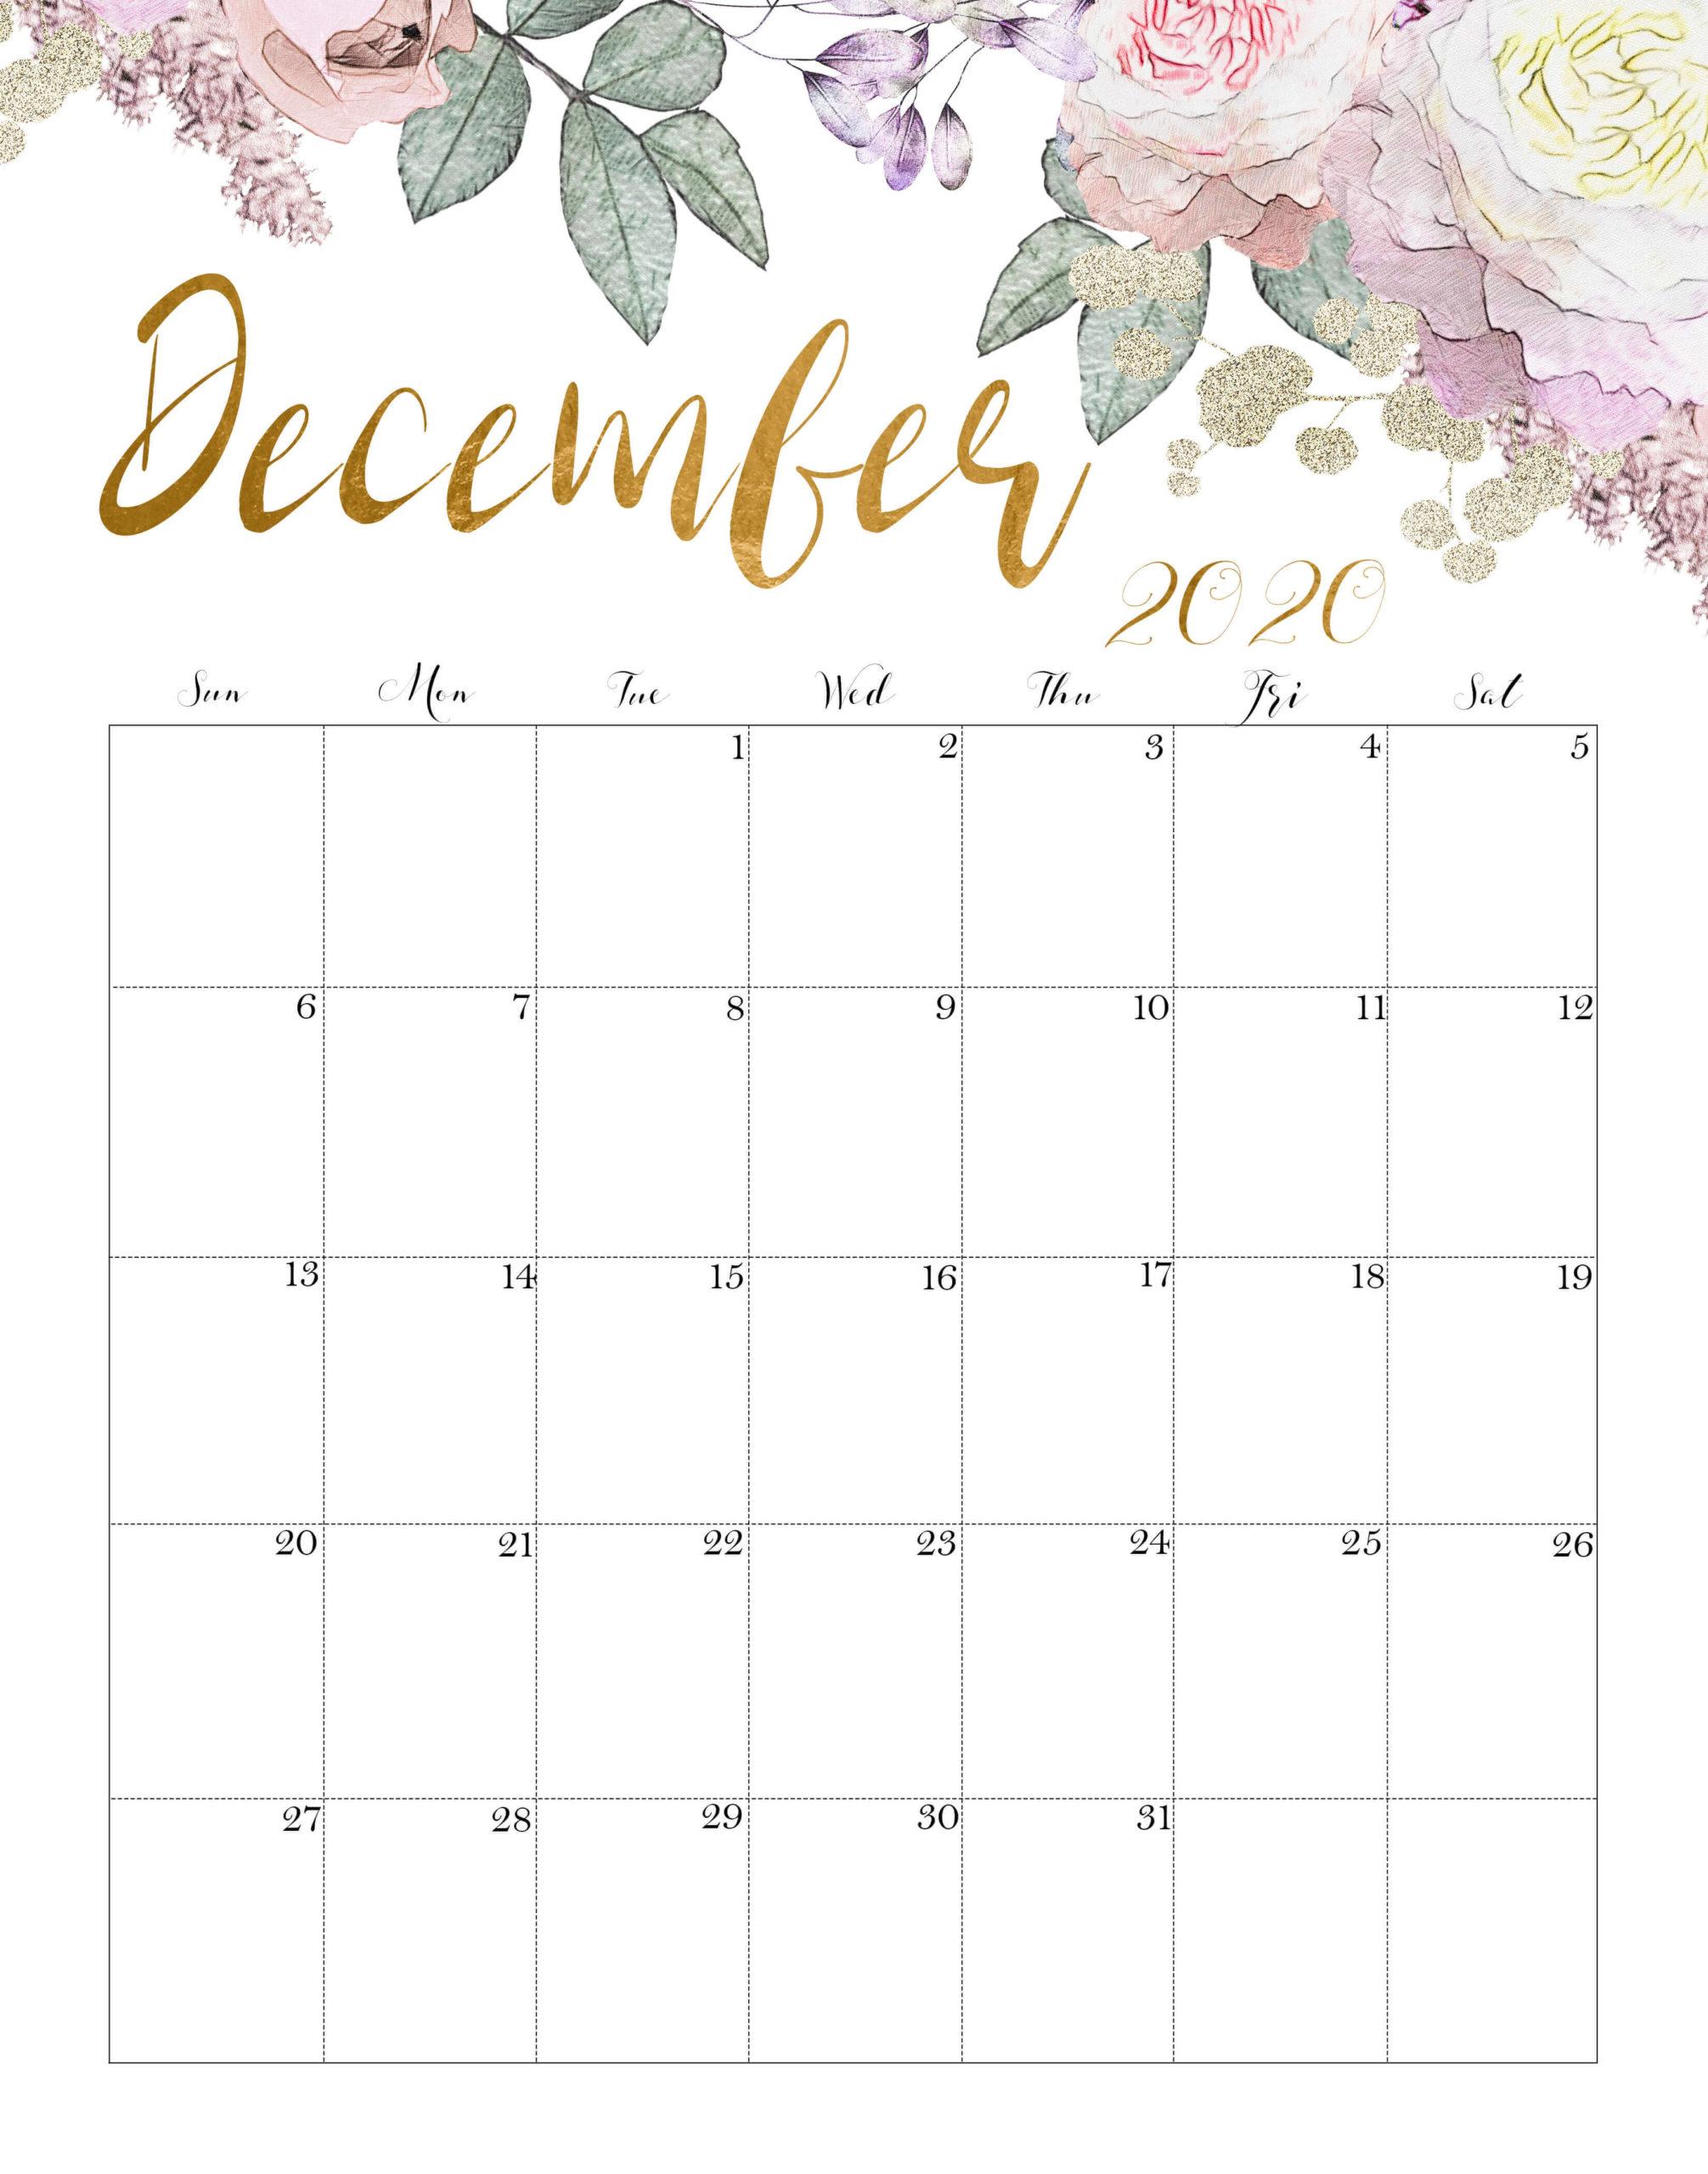 December 2020 Office Desk Calendar